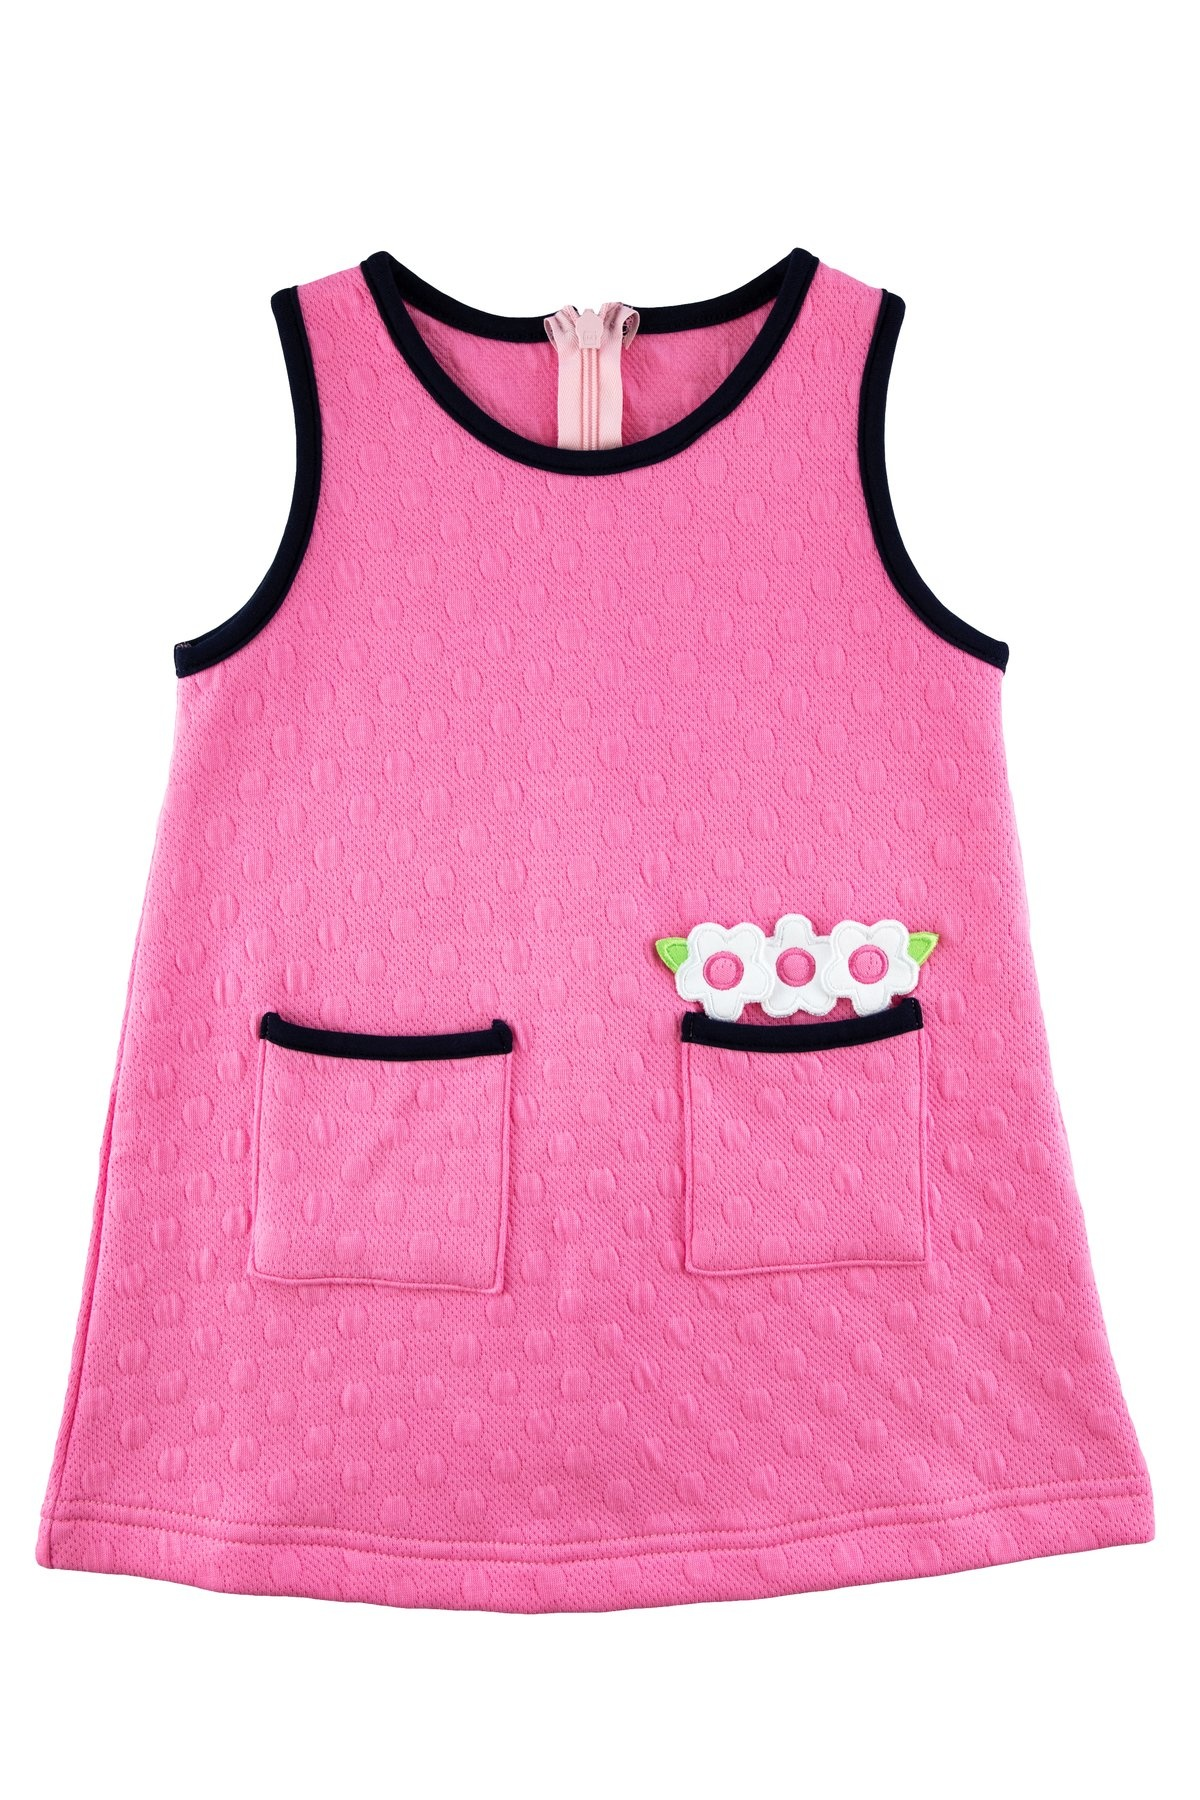 Florence Eiseman Pink Textured Knit Jumper